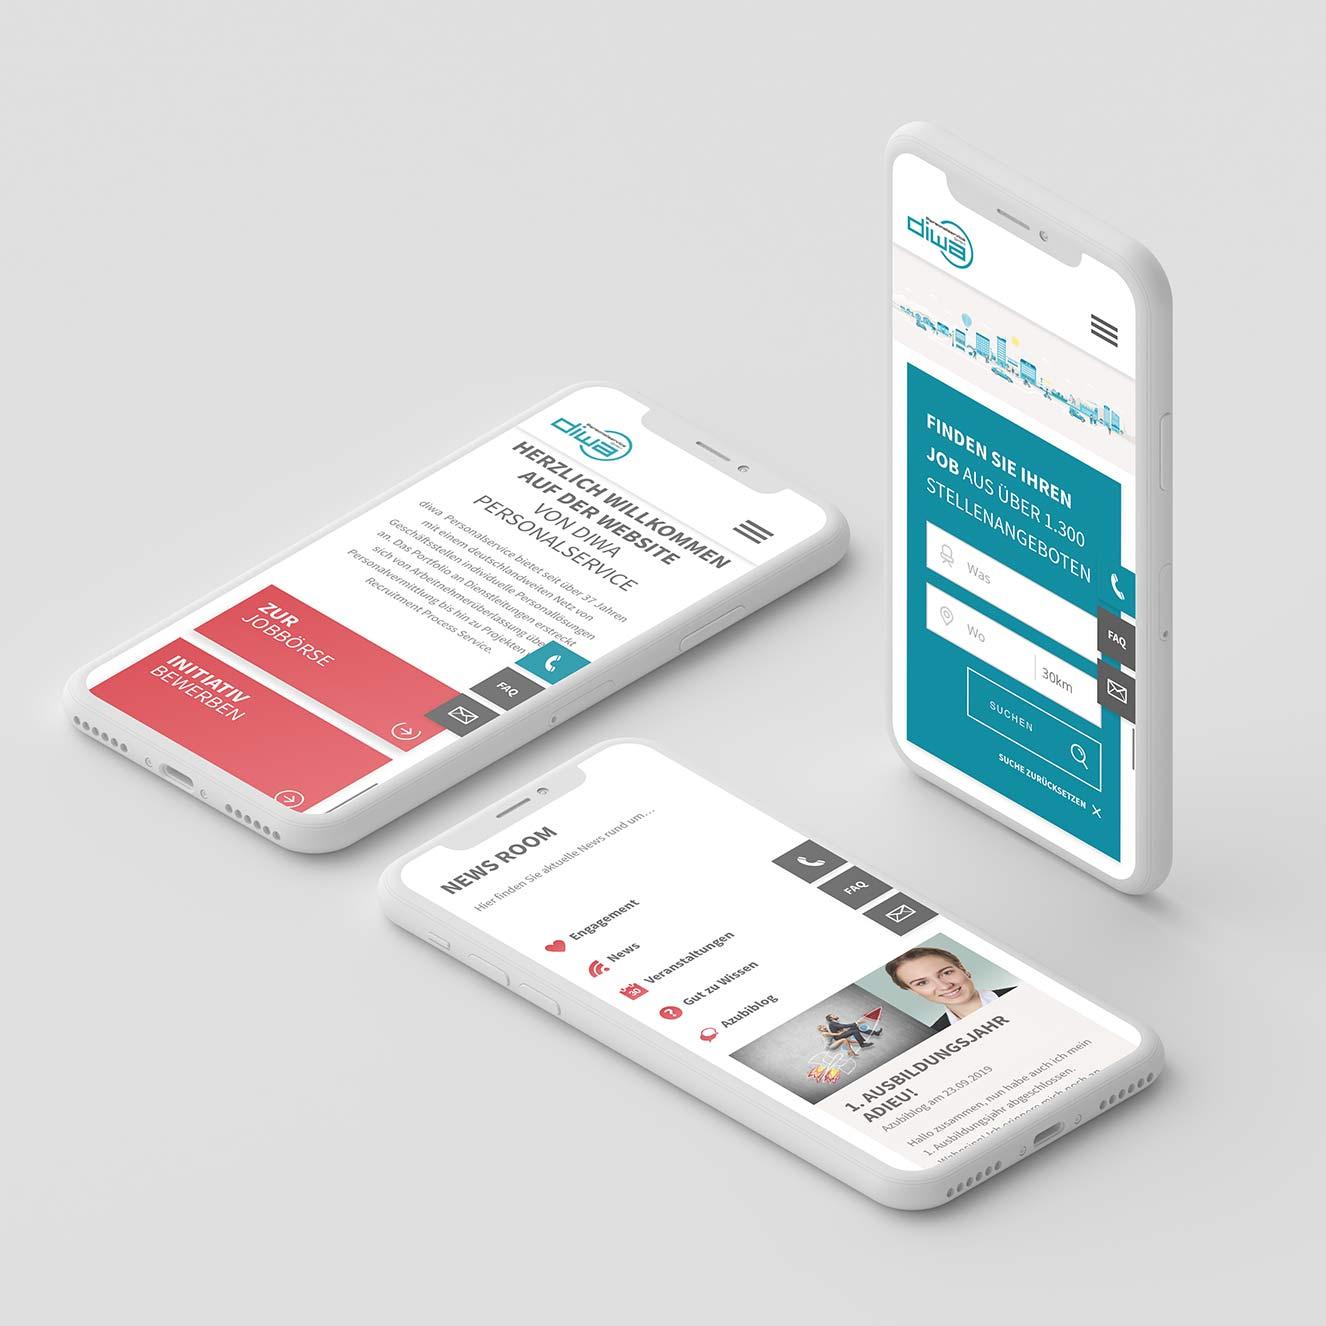 Diwa Personalservice Relaunch Website